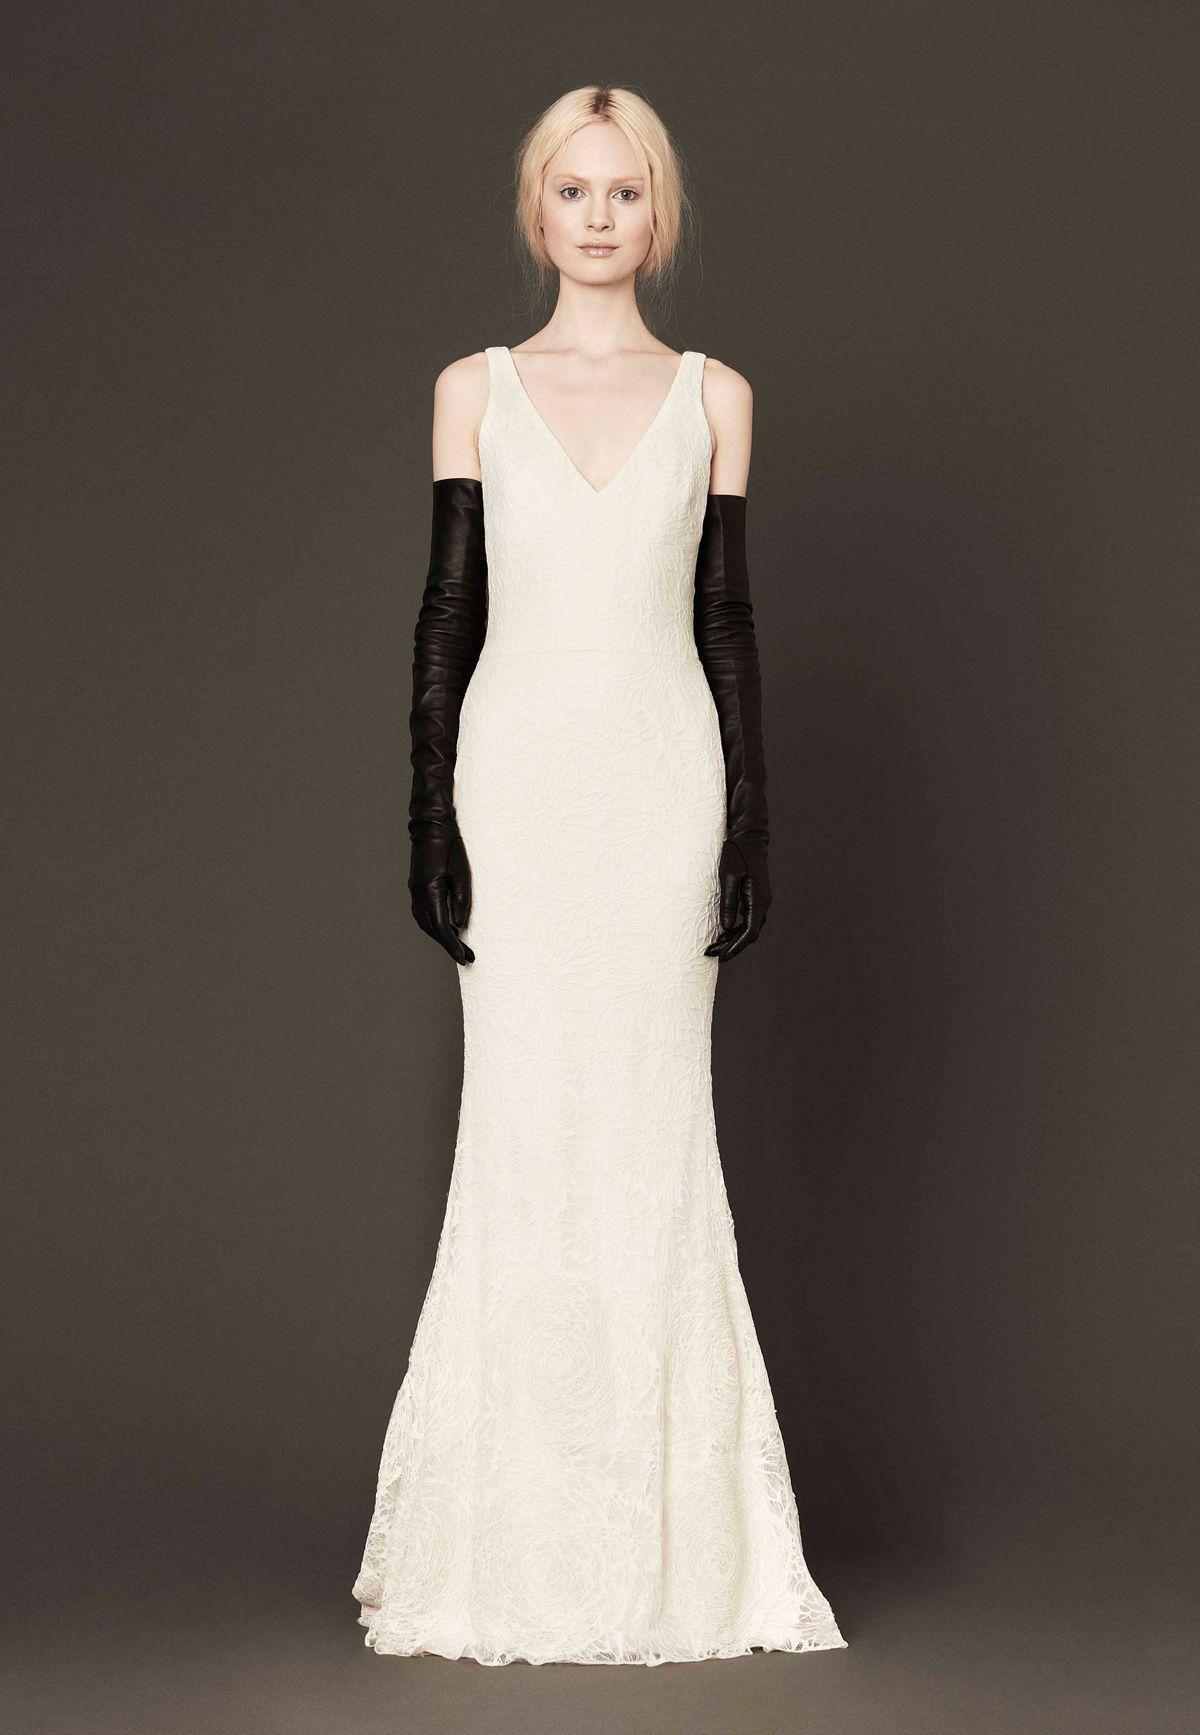 Vera wang designer wedding dresses  Vera Wang Wedding Dress Preowned Mallory Mermaid Silhouette V Neck